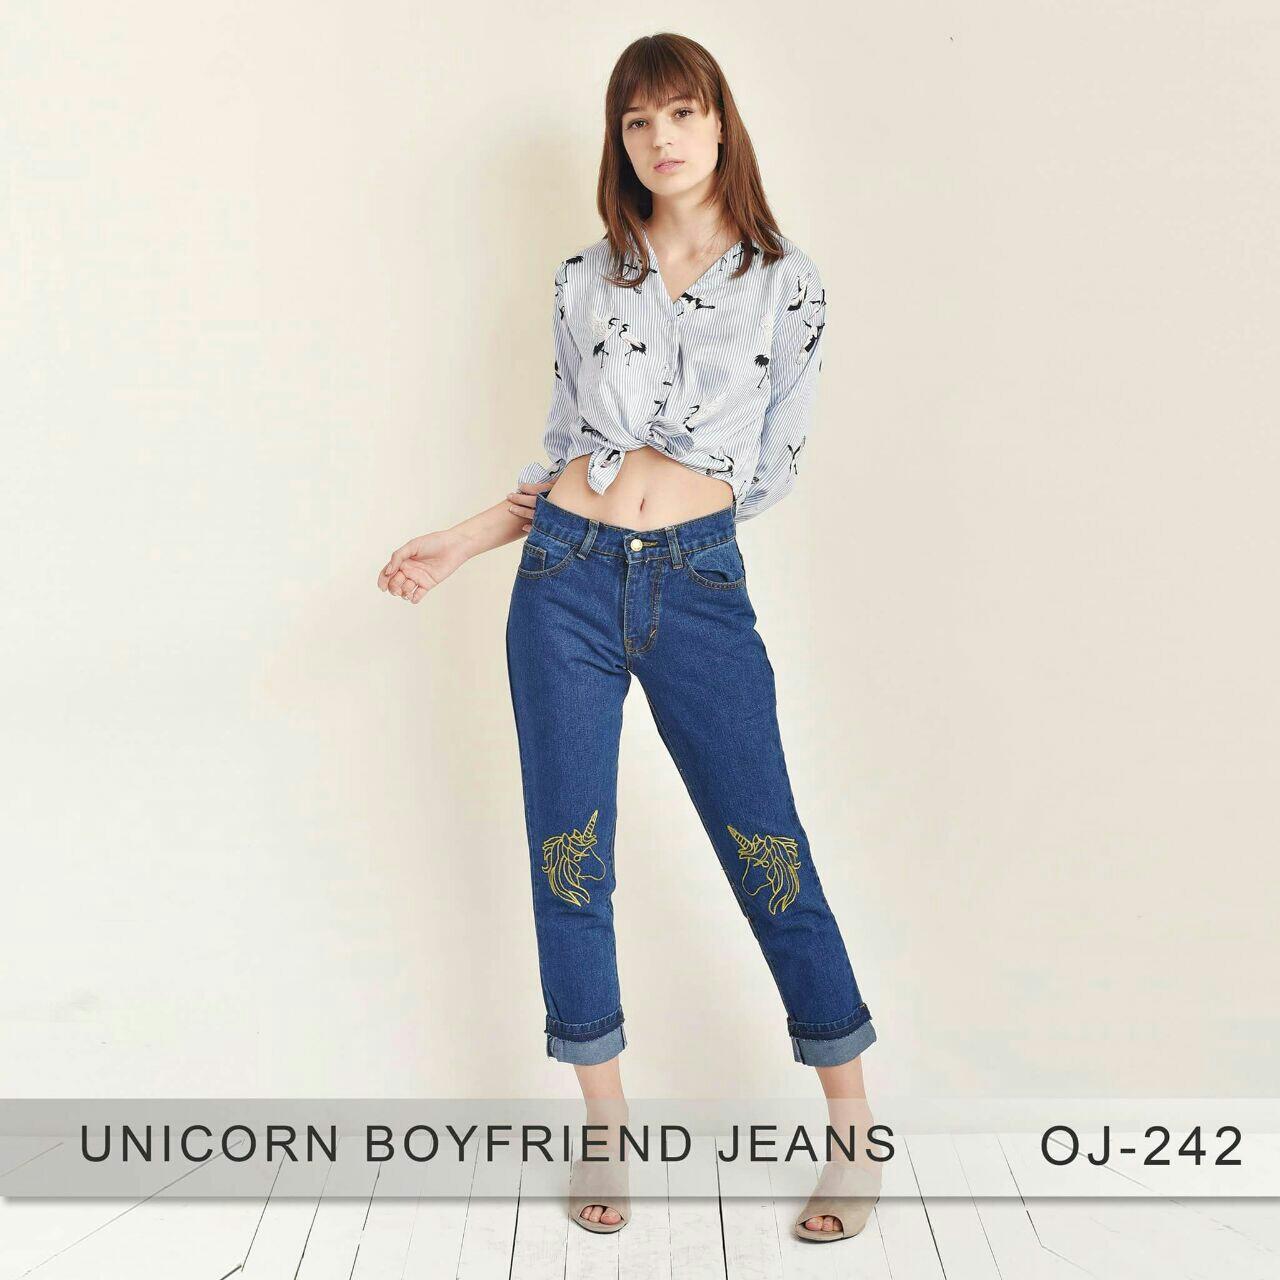 Unicorn Boyfriend